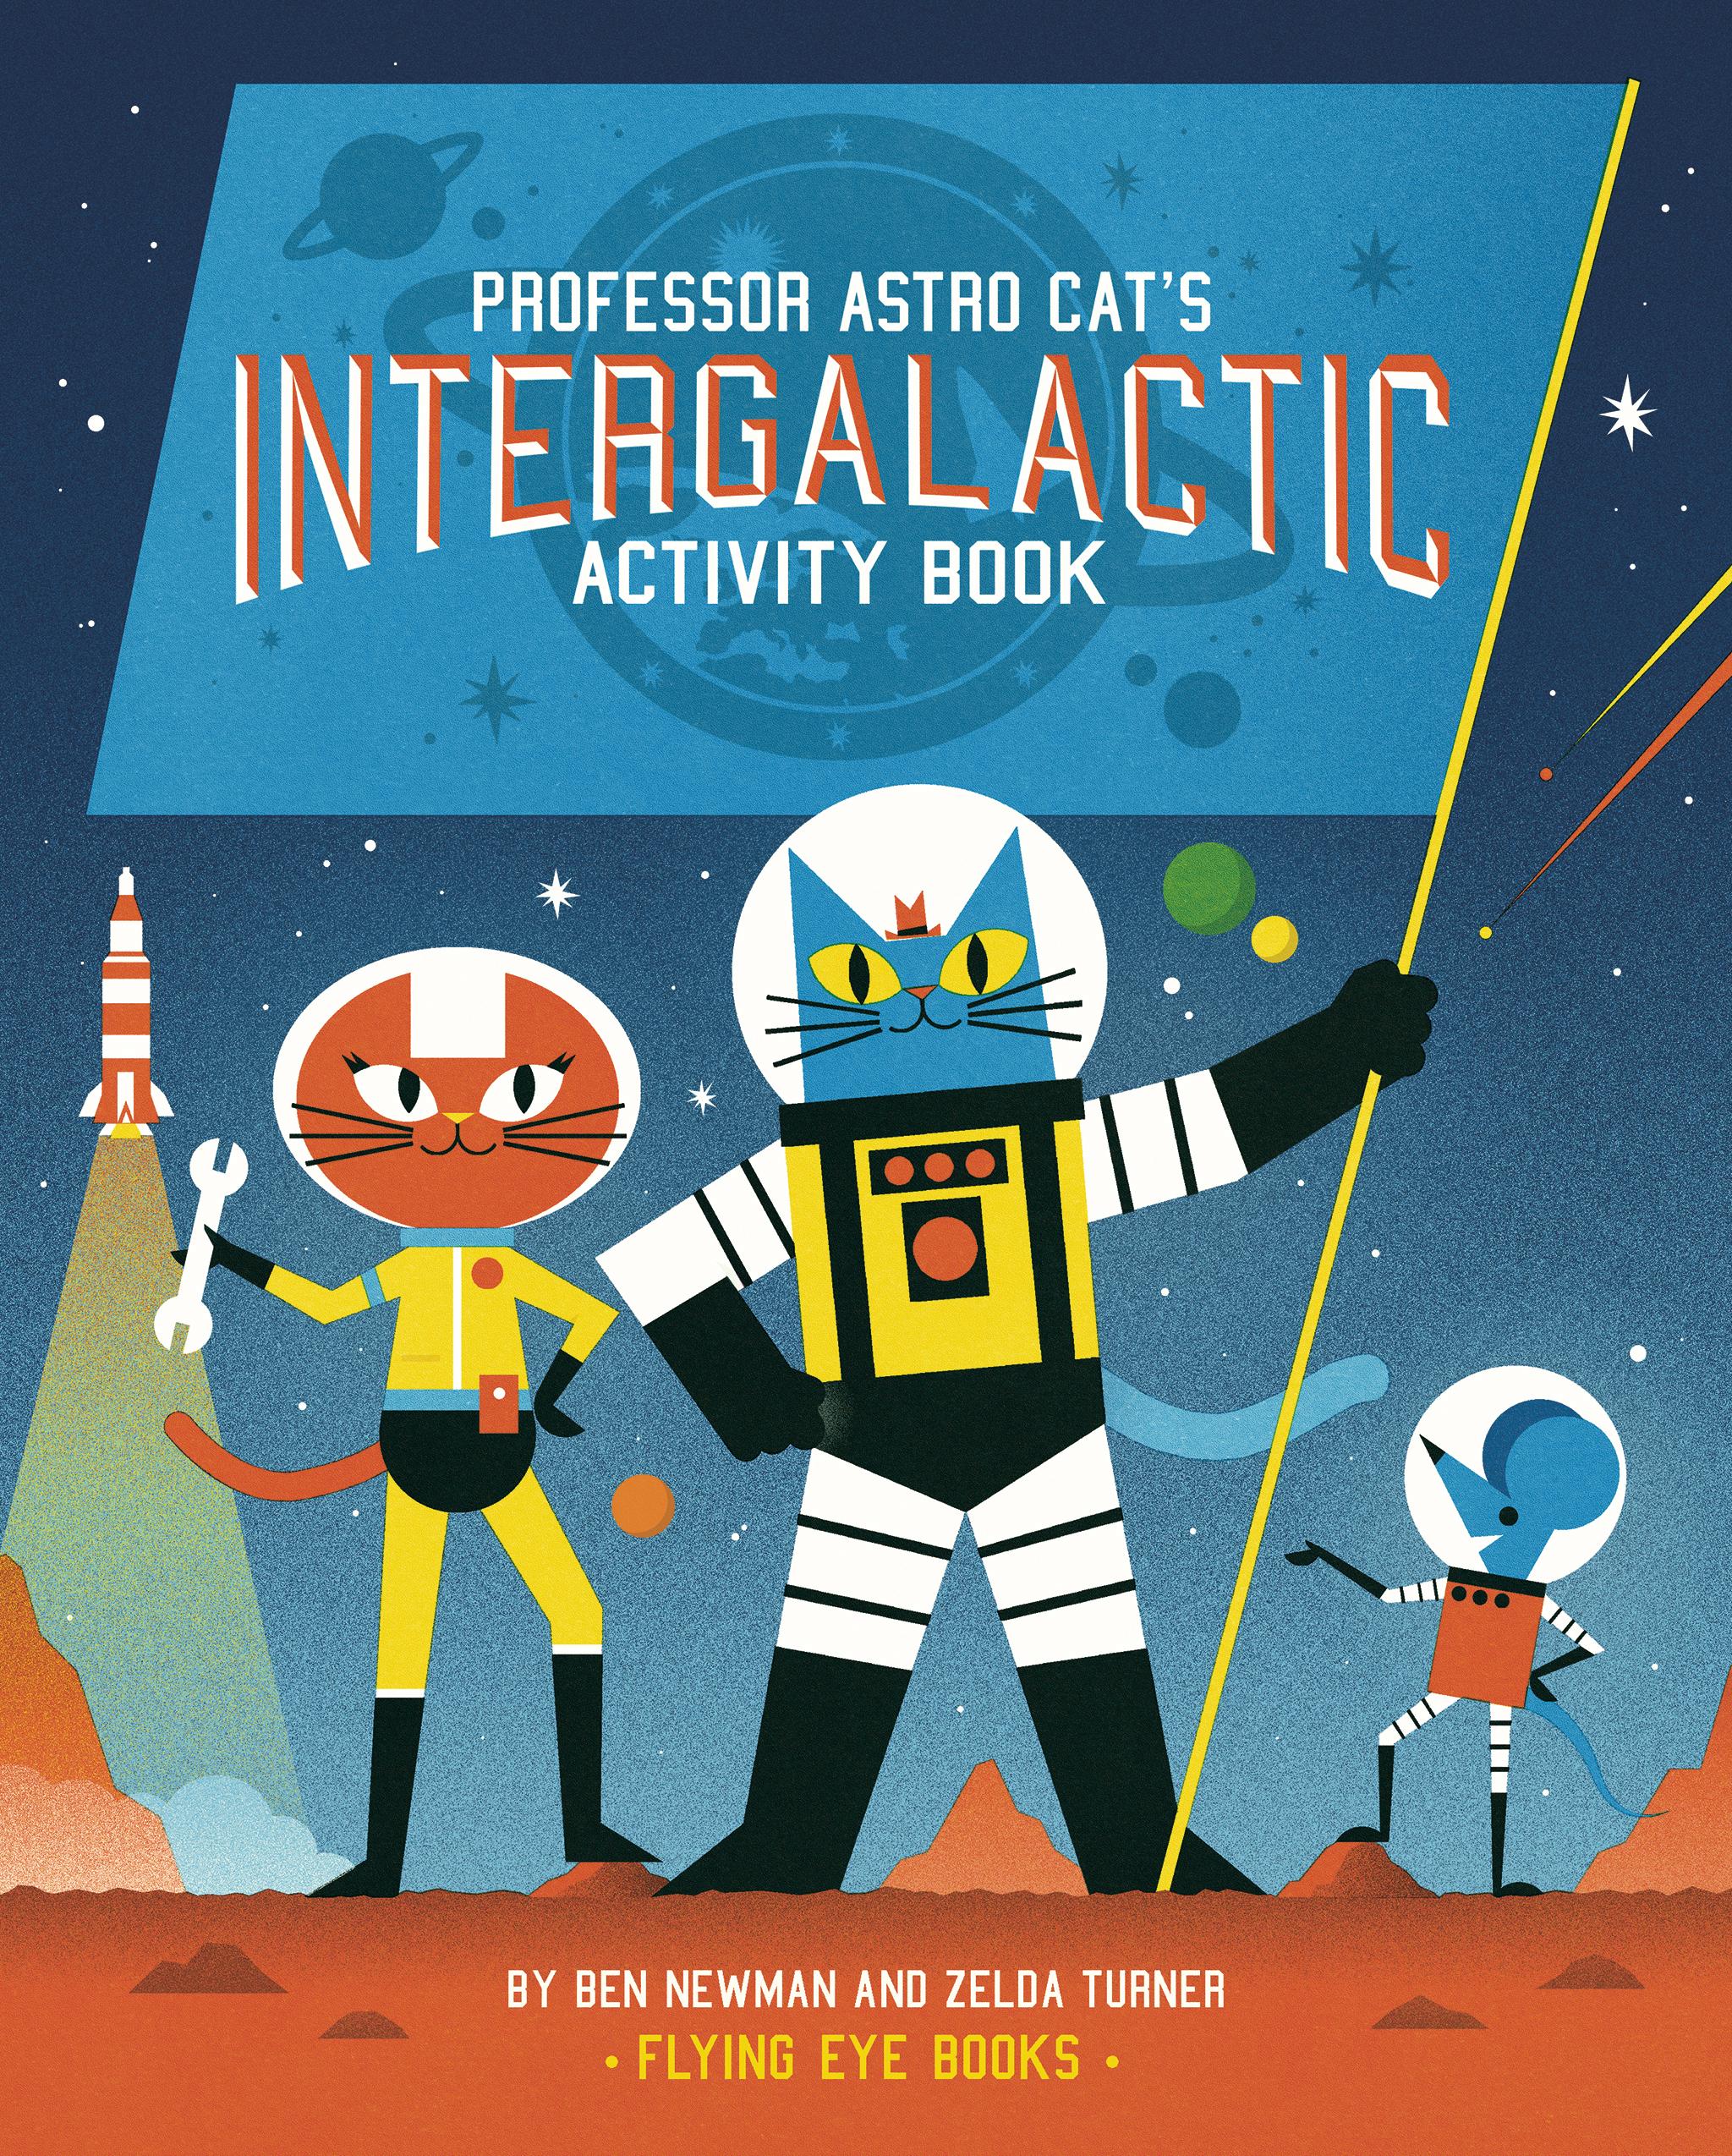 Professor Astro Cat's Intergalactic Activity Book